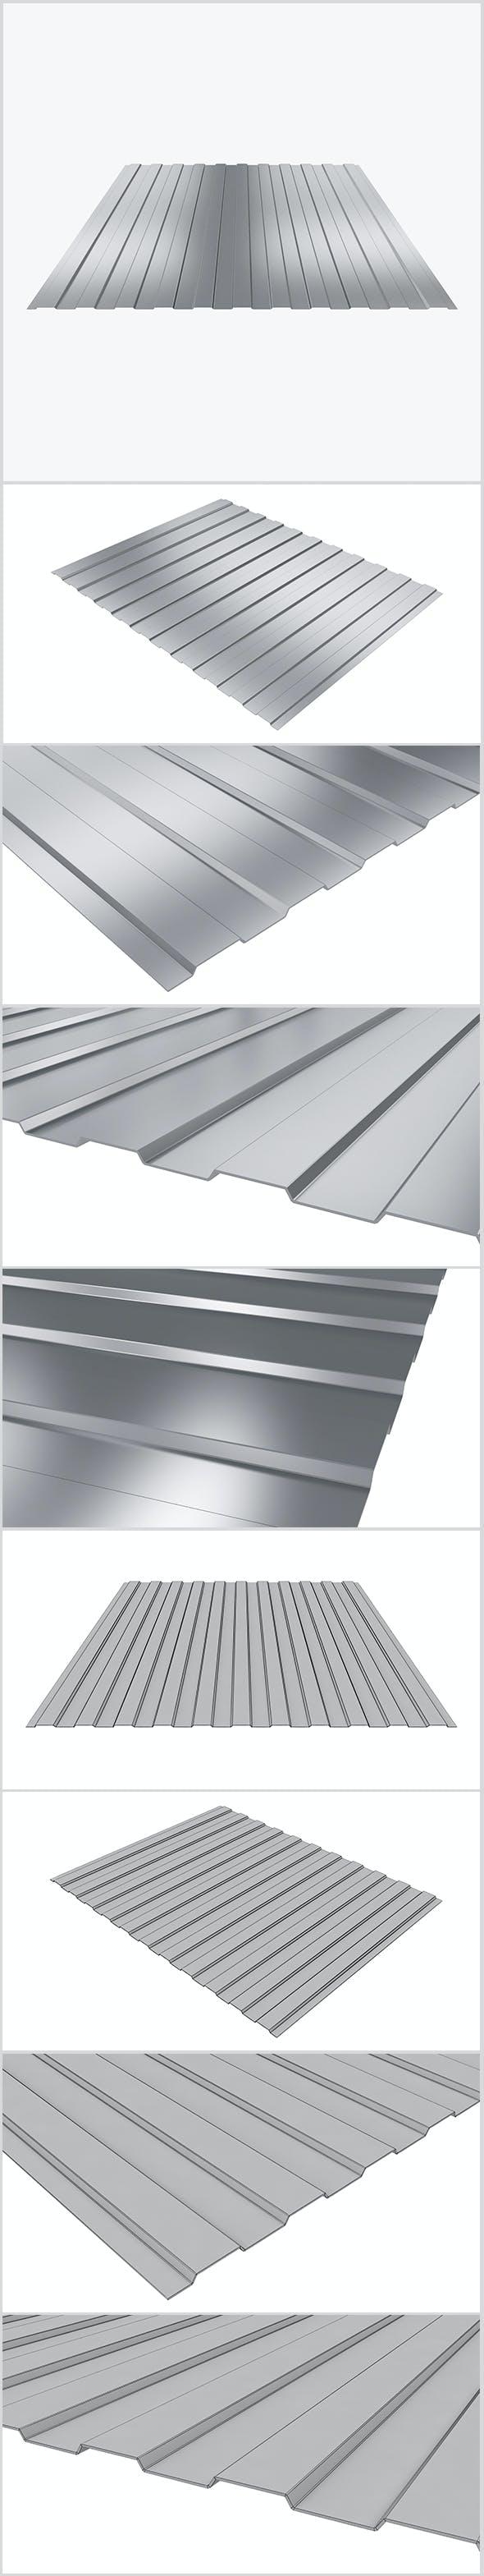 Profiled sheet 03 - 3DOcean Item for Sale